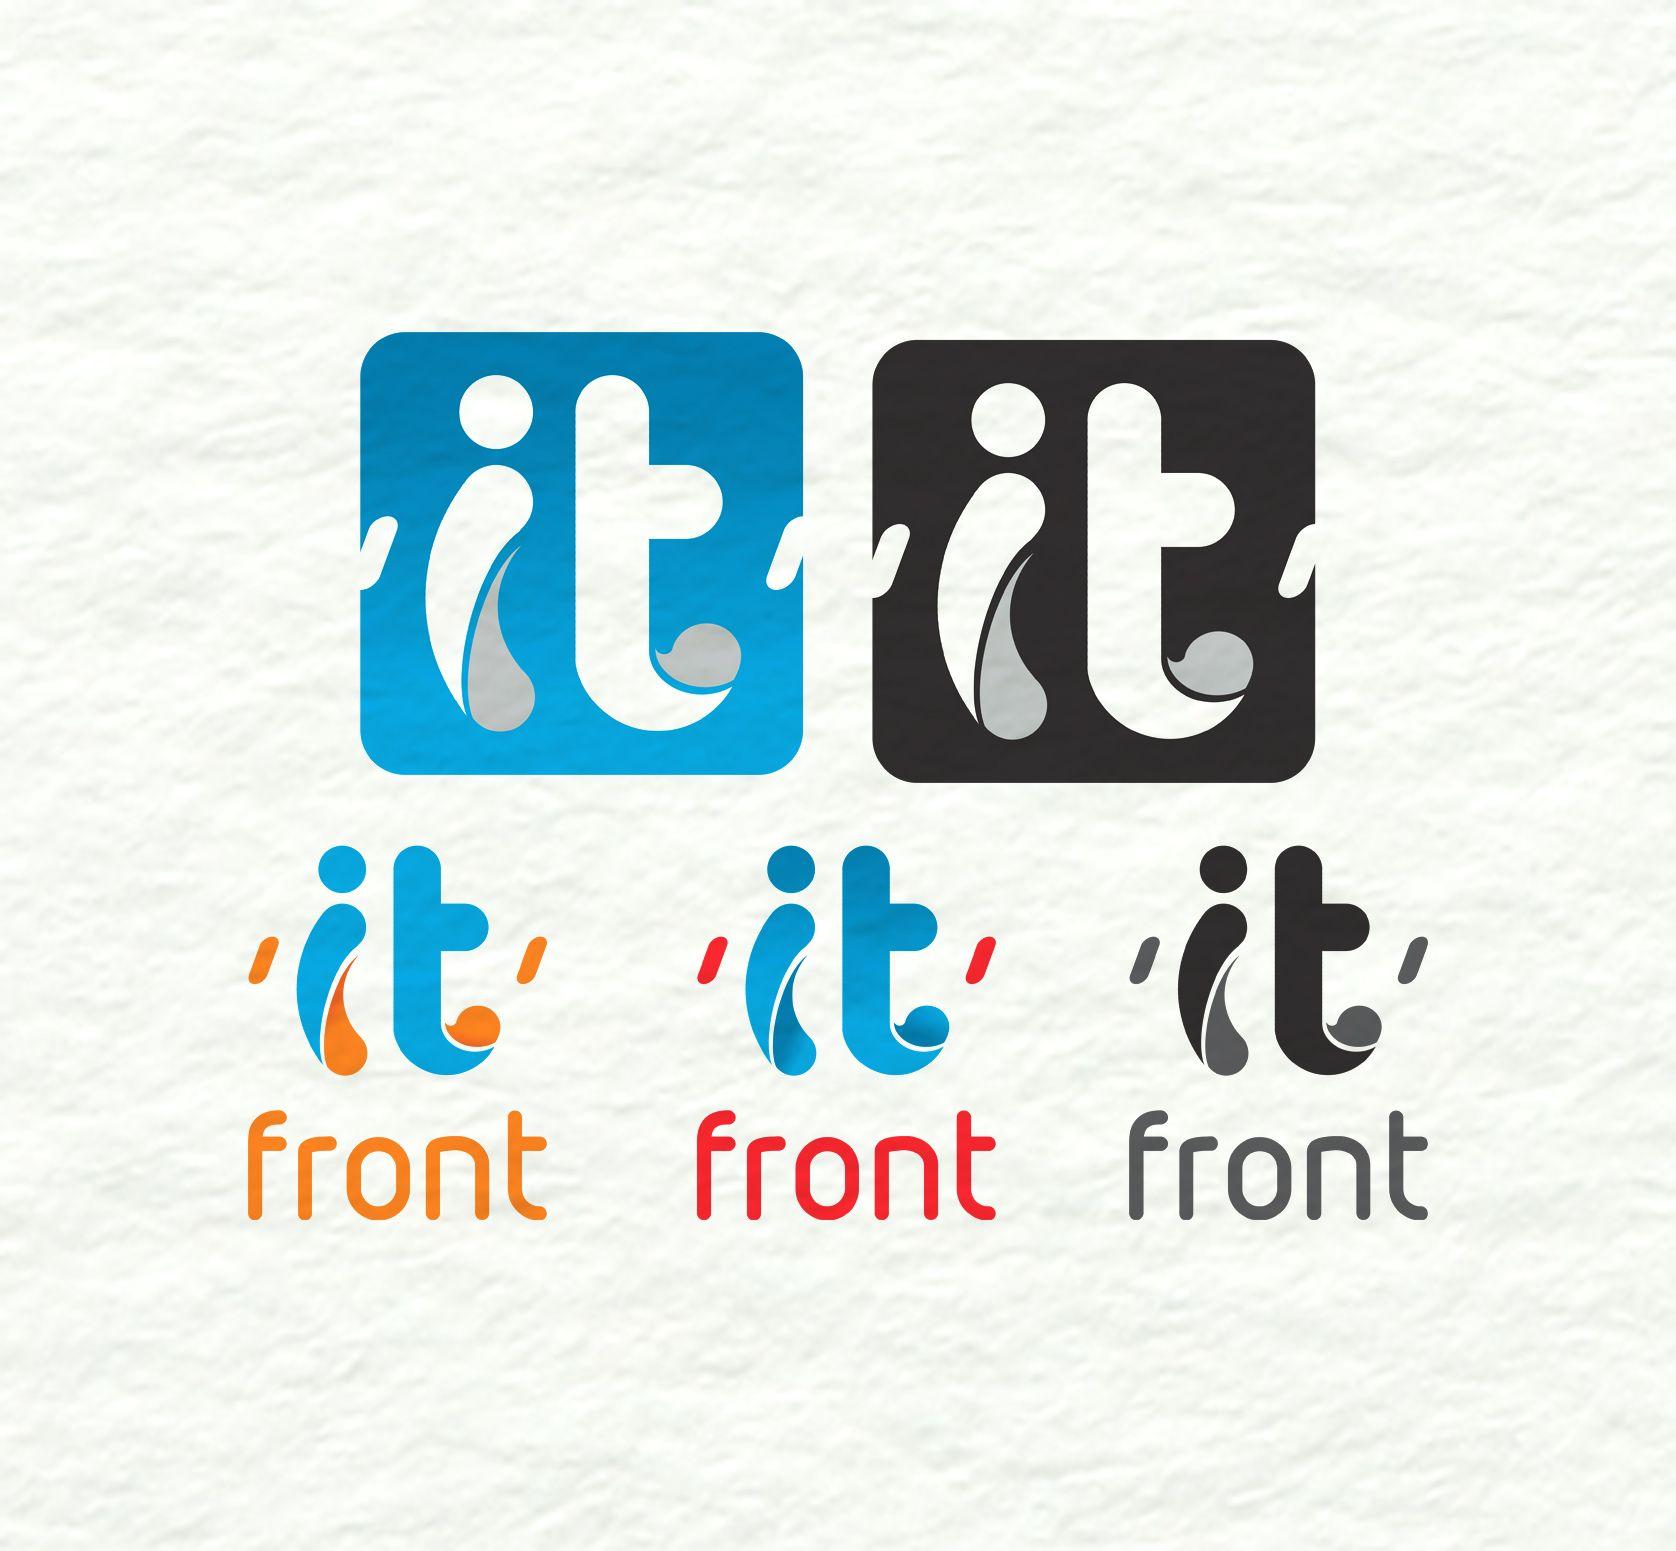 Создание логотипа компании АйТи Фронт (itfront.ru) - дизайнер kuchupen